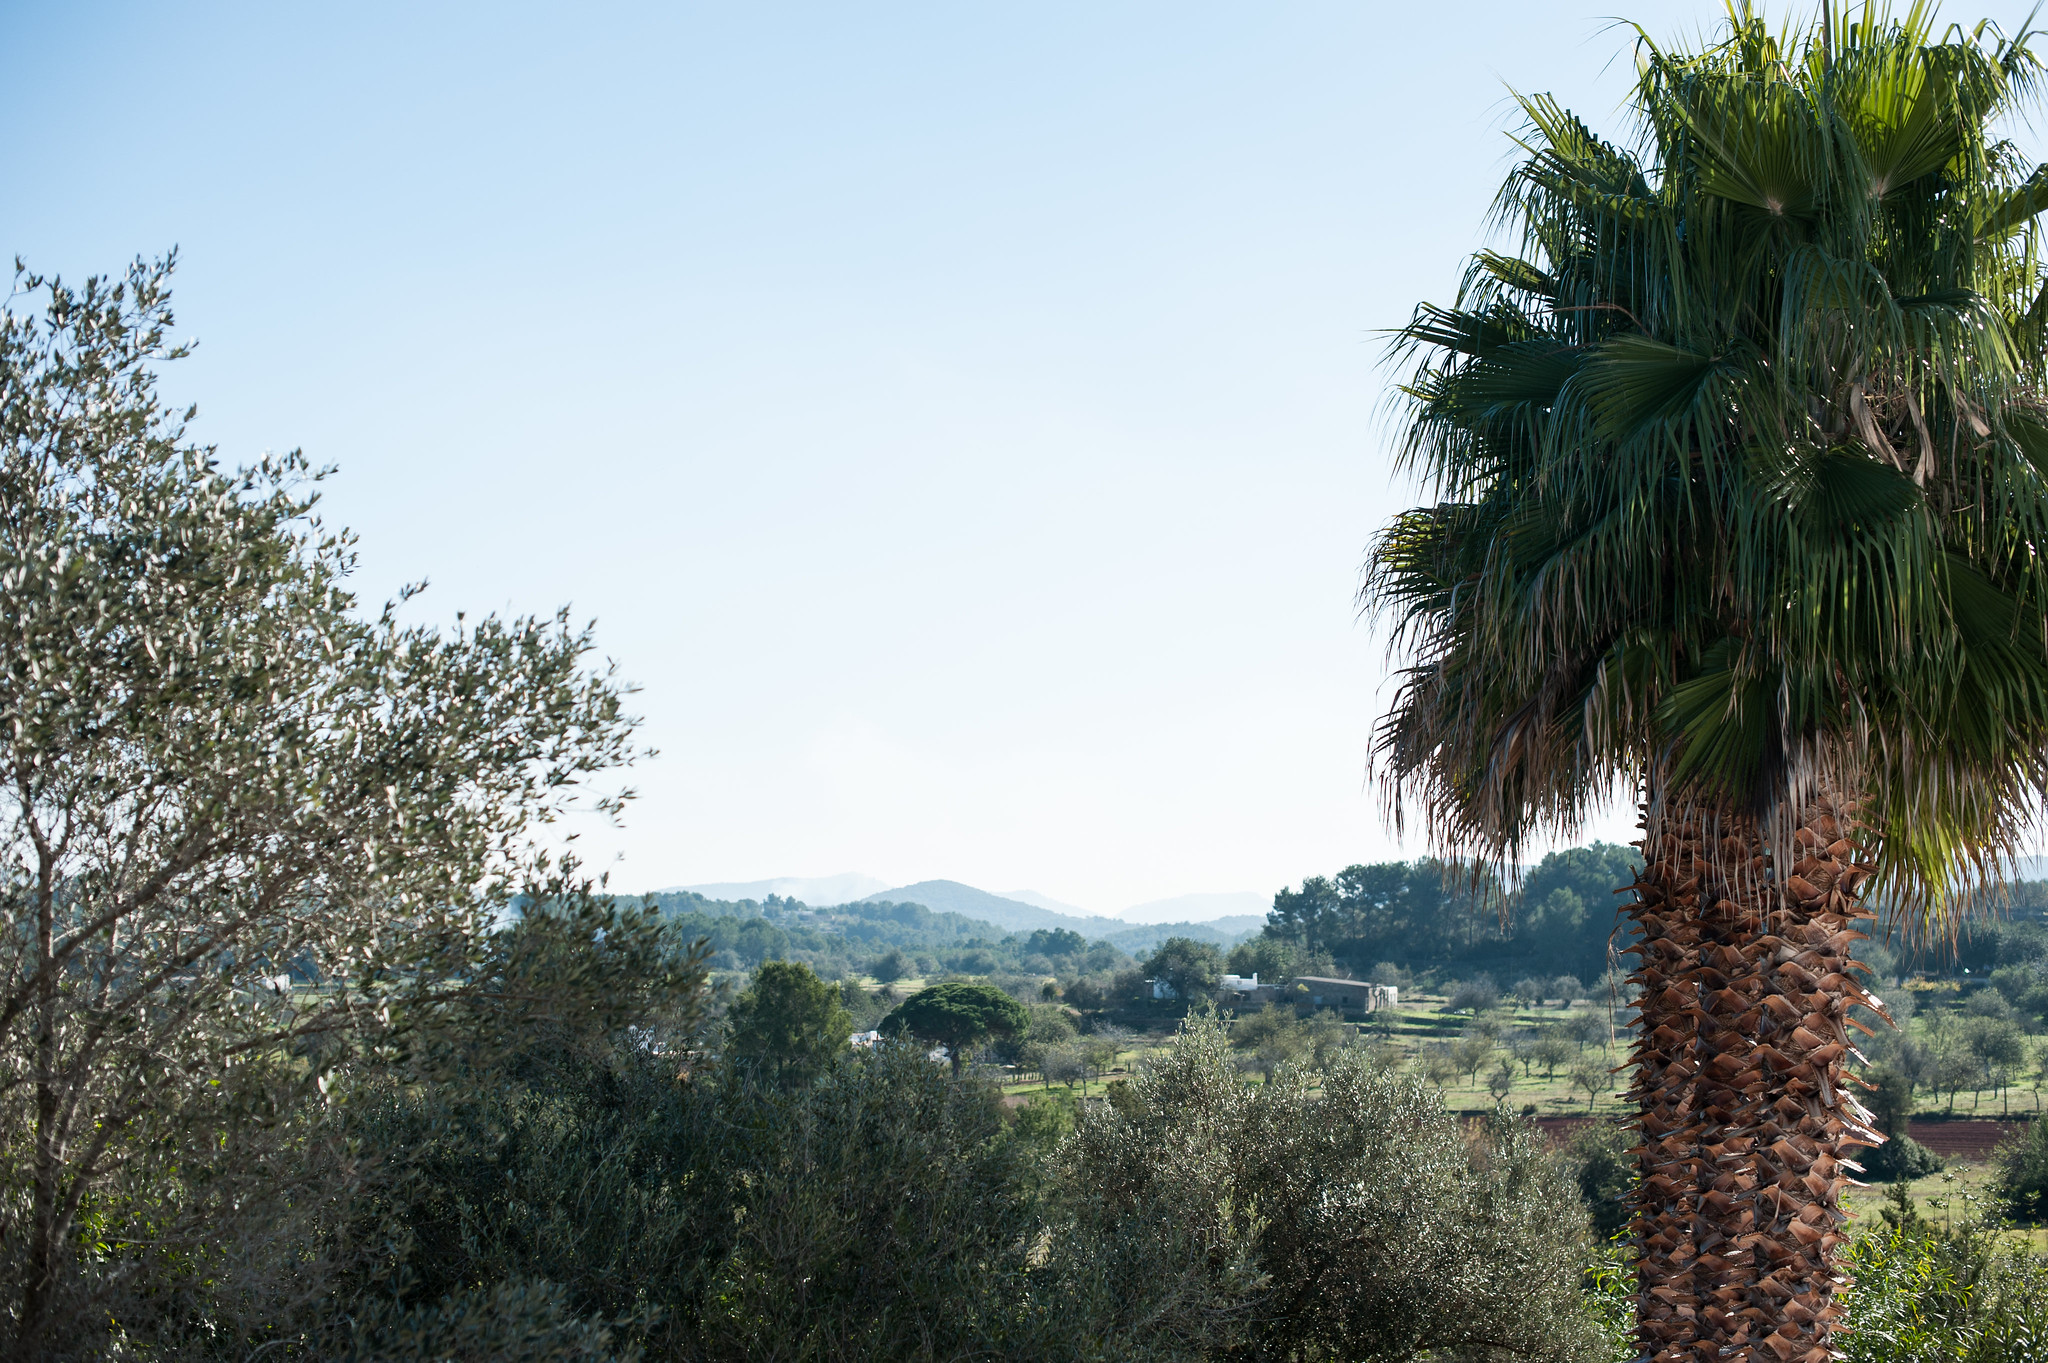 https://www.white-ibiza.com/wp-content/uploads/2020/06/white-ibiza-villas-can-blay-exterior-campo-view.jpg